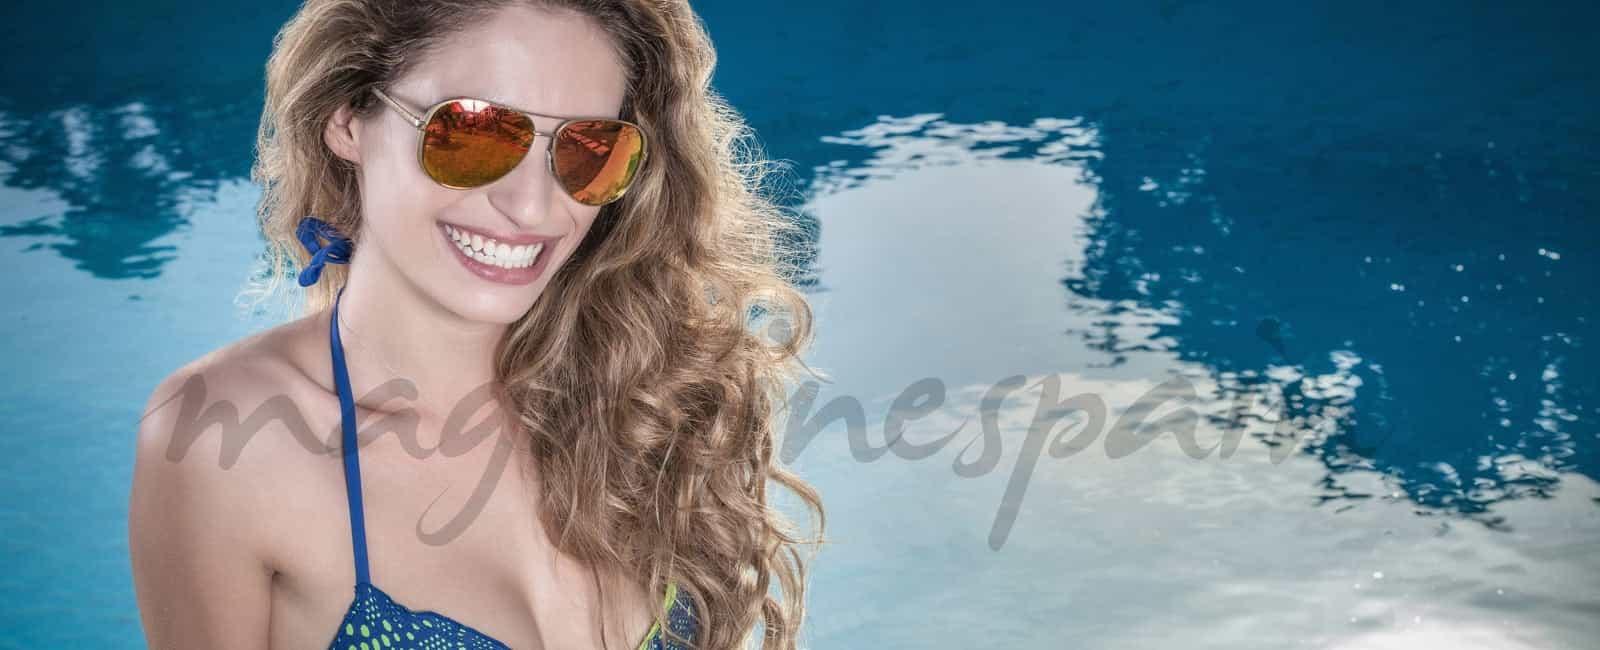 Protege tu pelo del sol